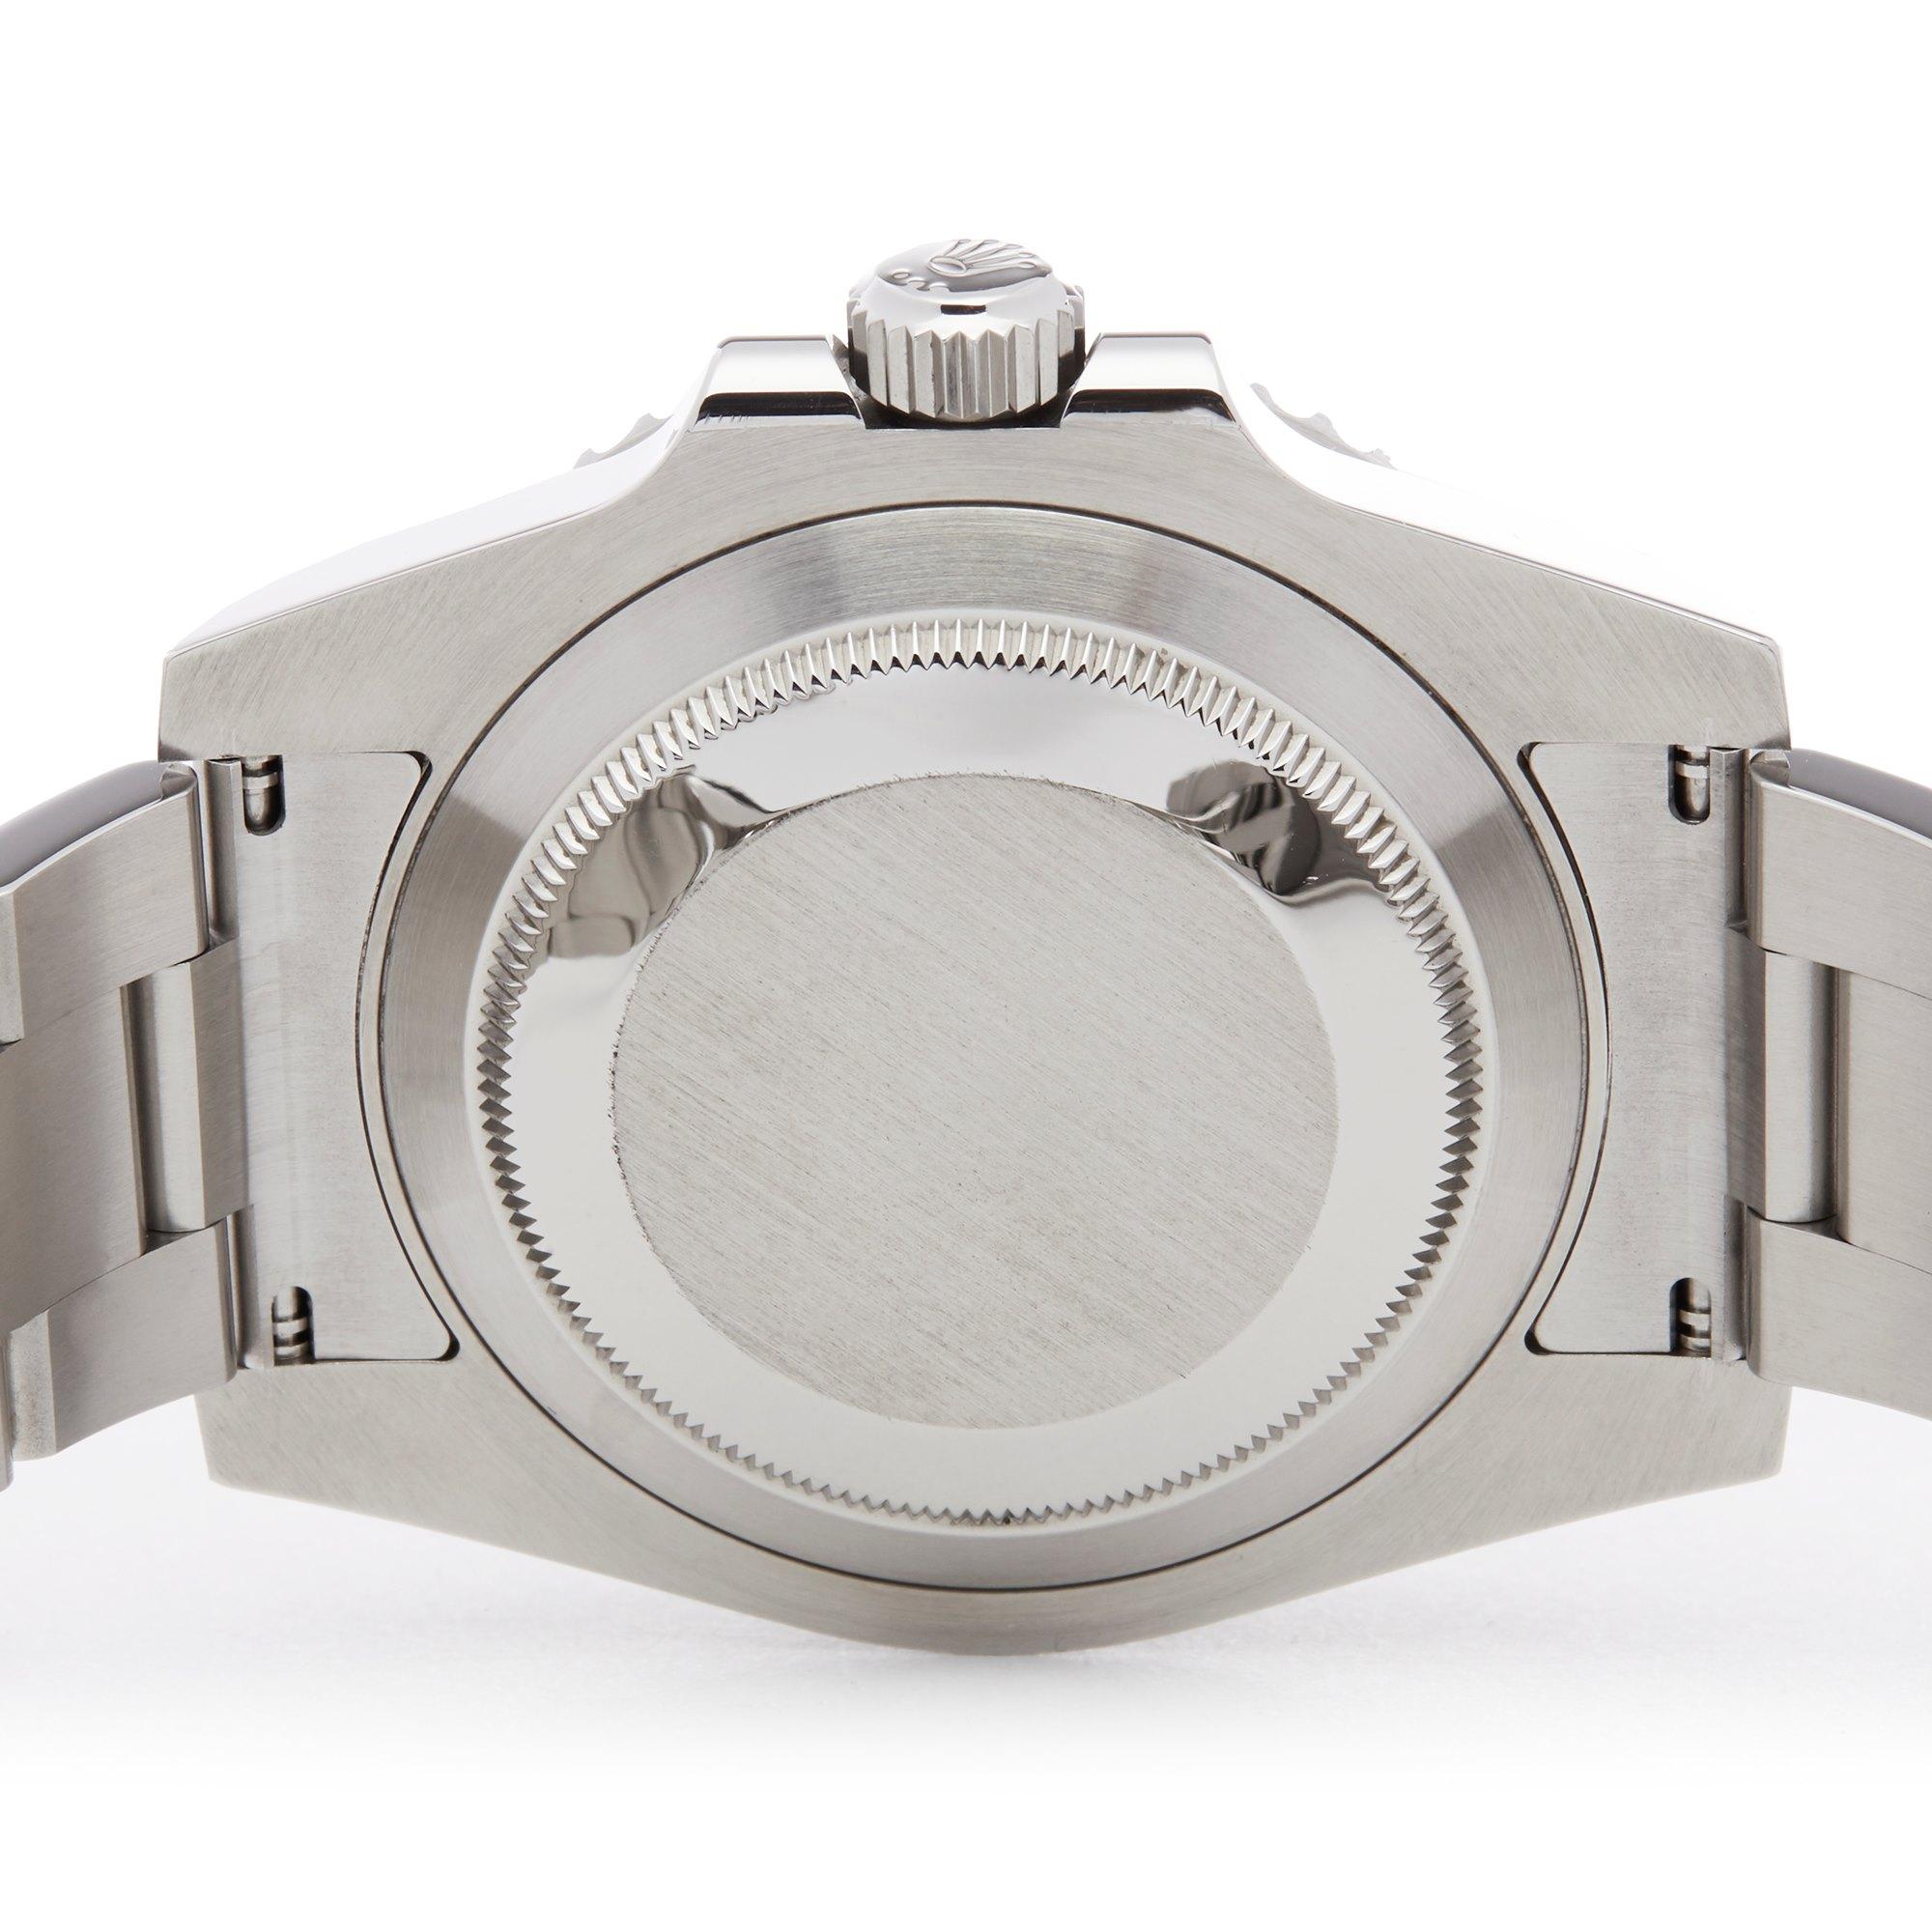 Rolex Submariner Date Stainless Steel 116610LN